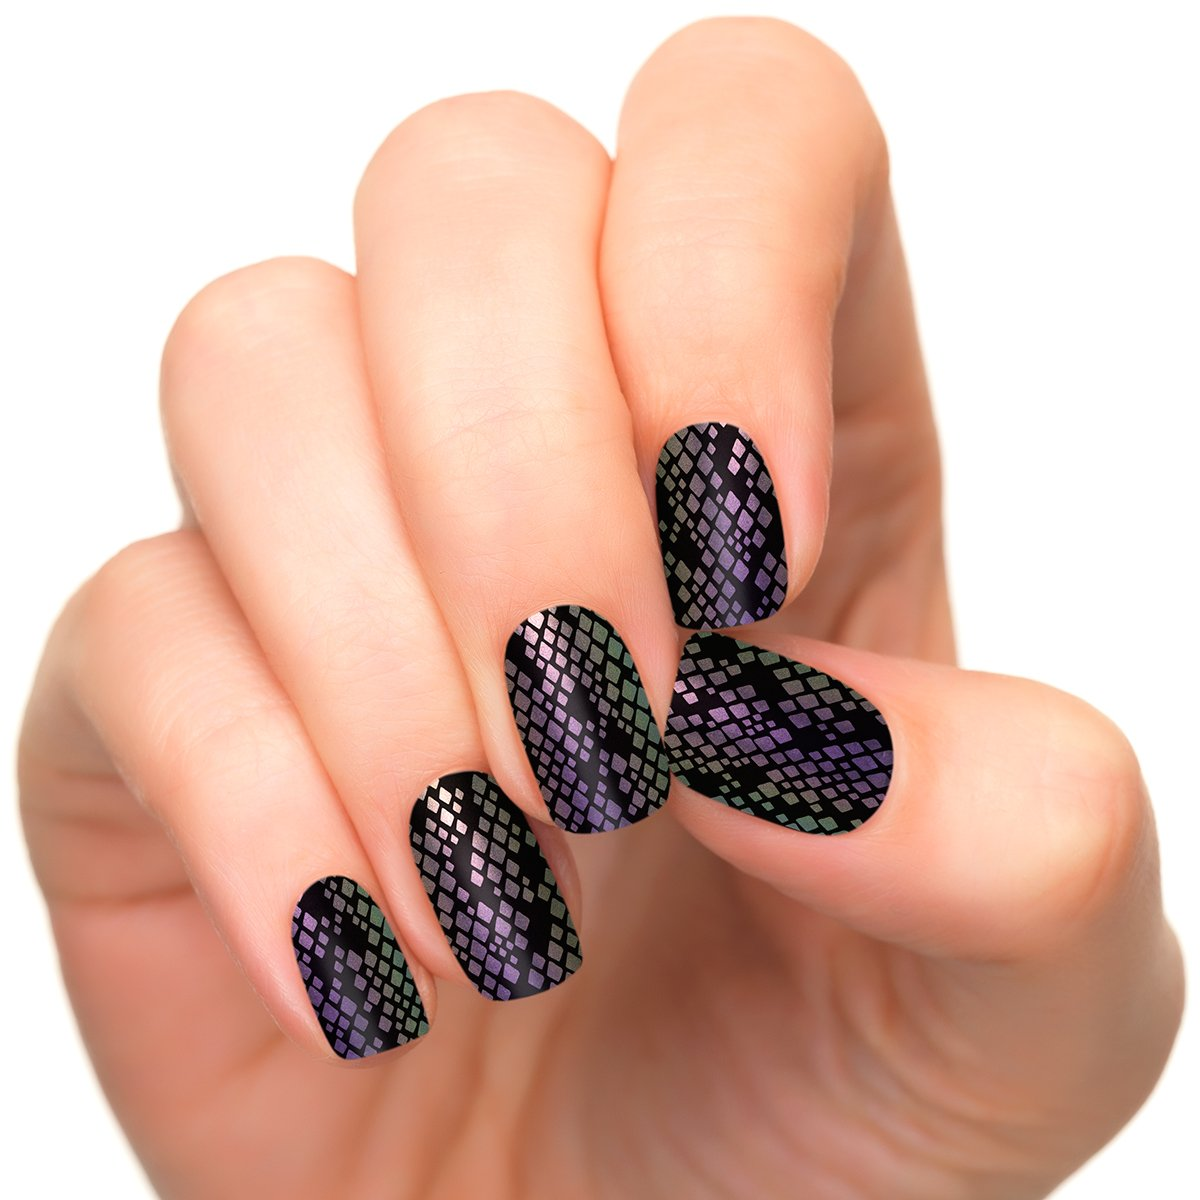 Incoco Duochrome Nail Polish Strips, Nail Art, Hypnotic